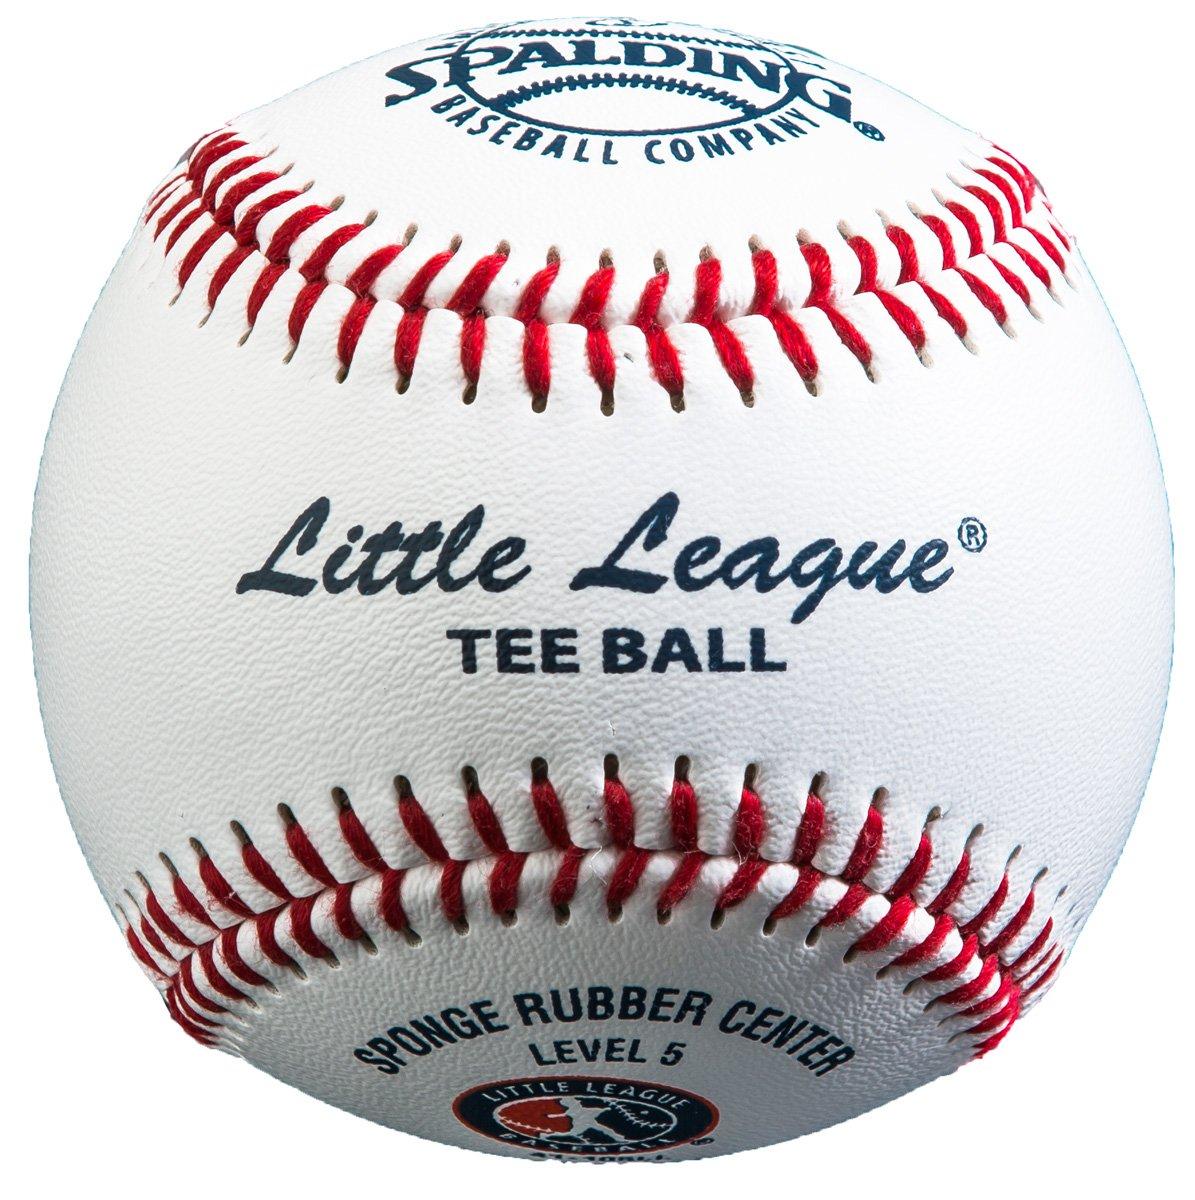 baseball ball www pixshark com images galleries with a baseball ball clipart png baseball glove and ball clipart